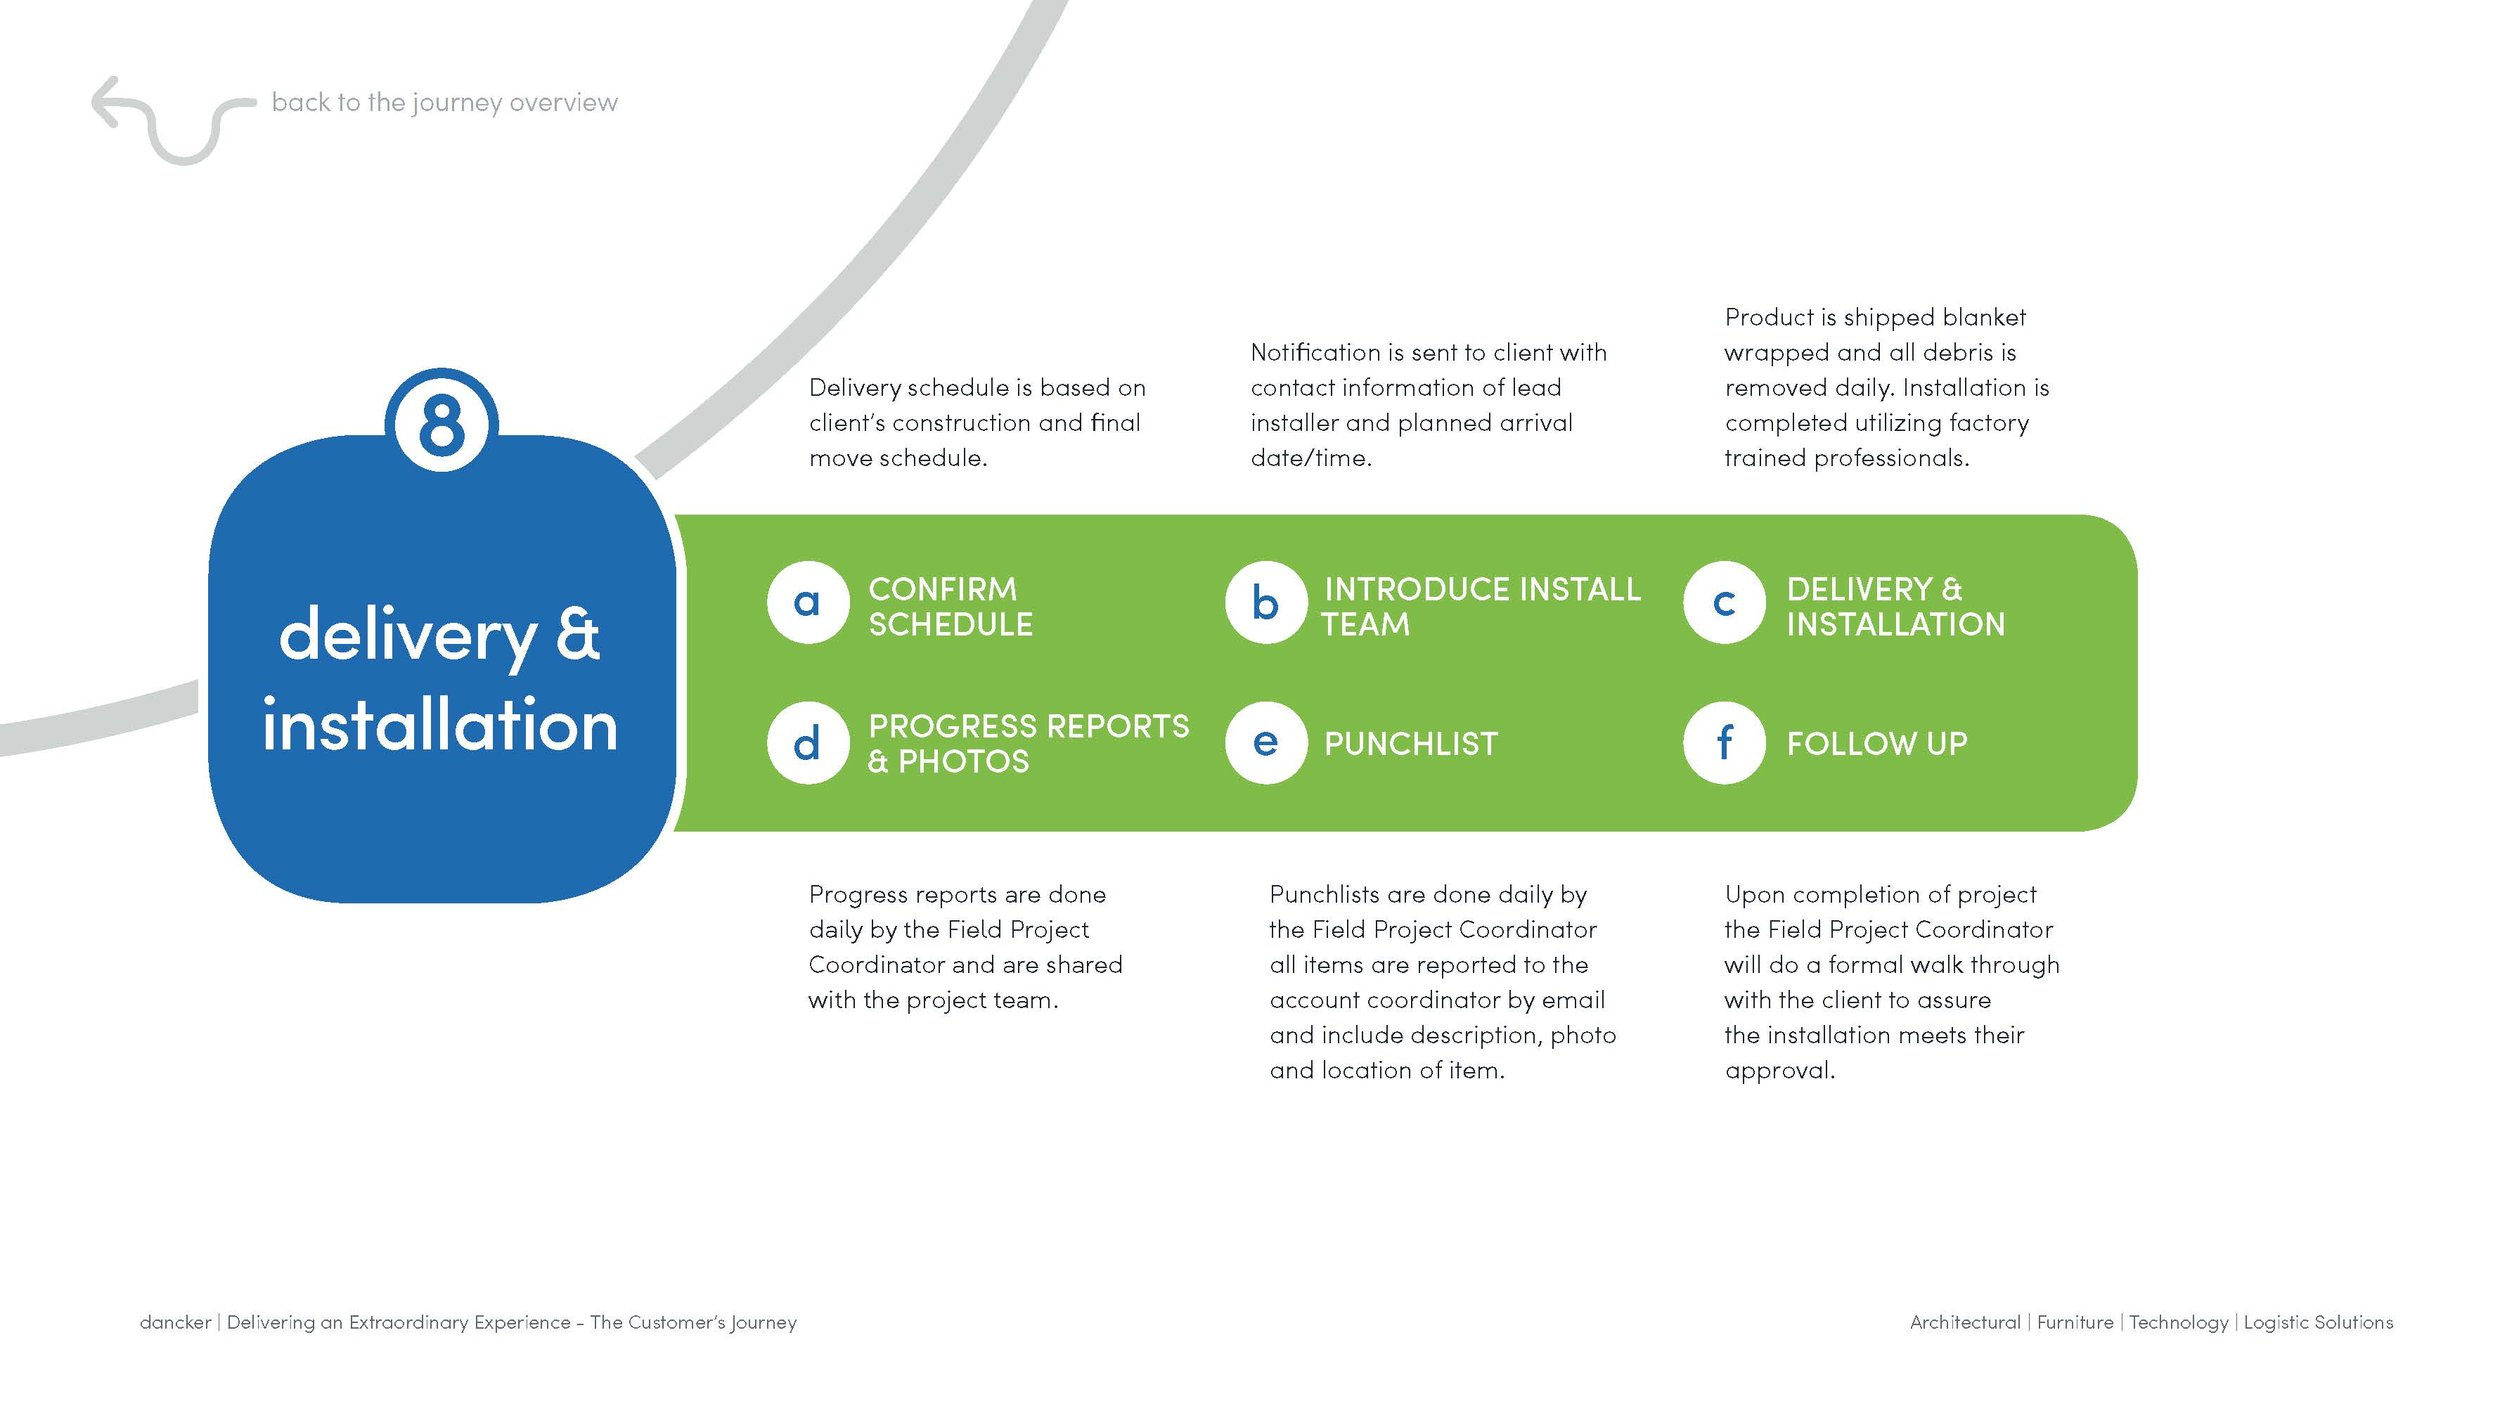 dancker_Customer Journey_Interactive Process_draft 3_Page_34.jpg